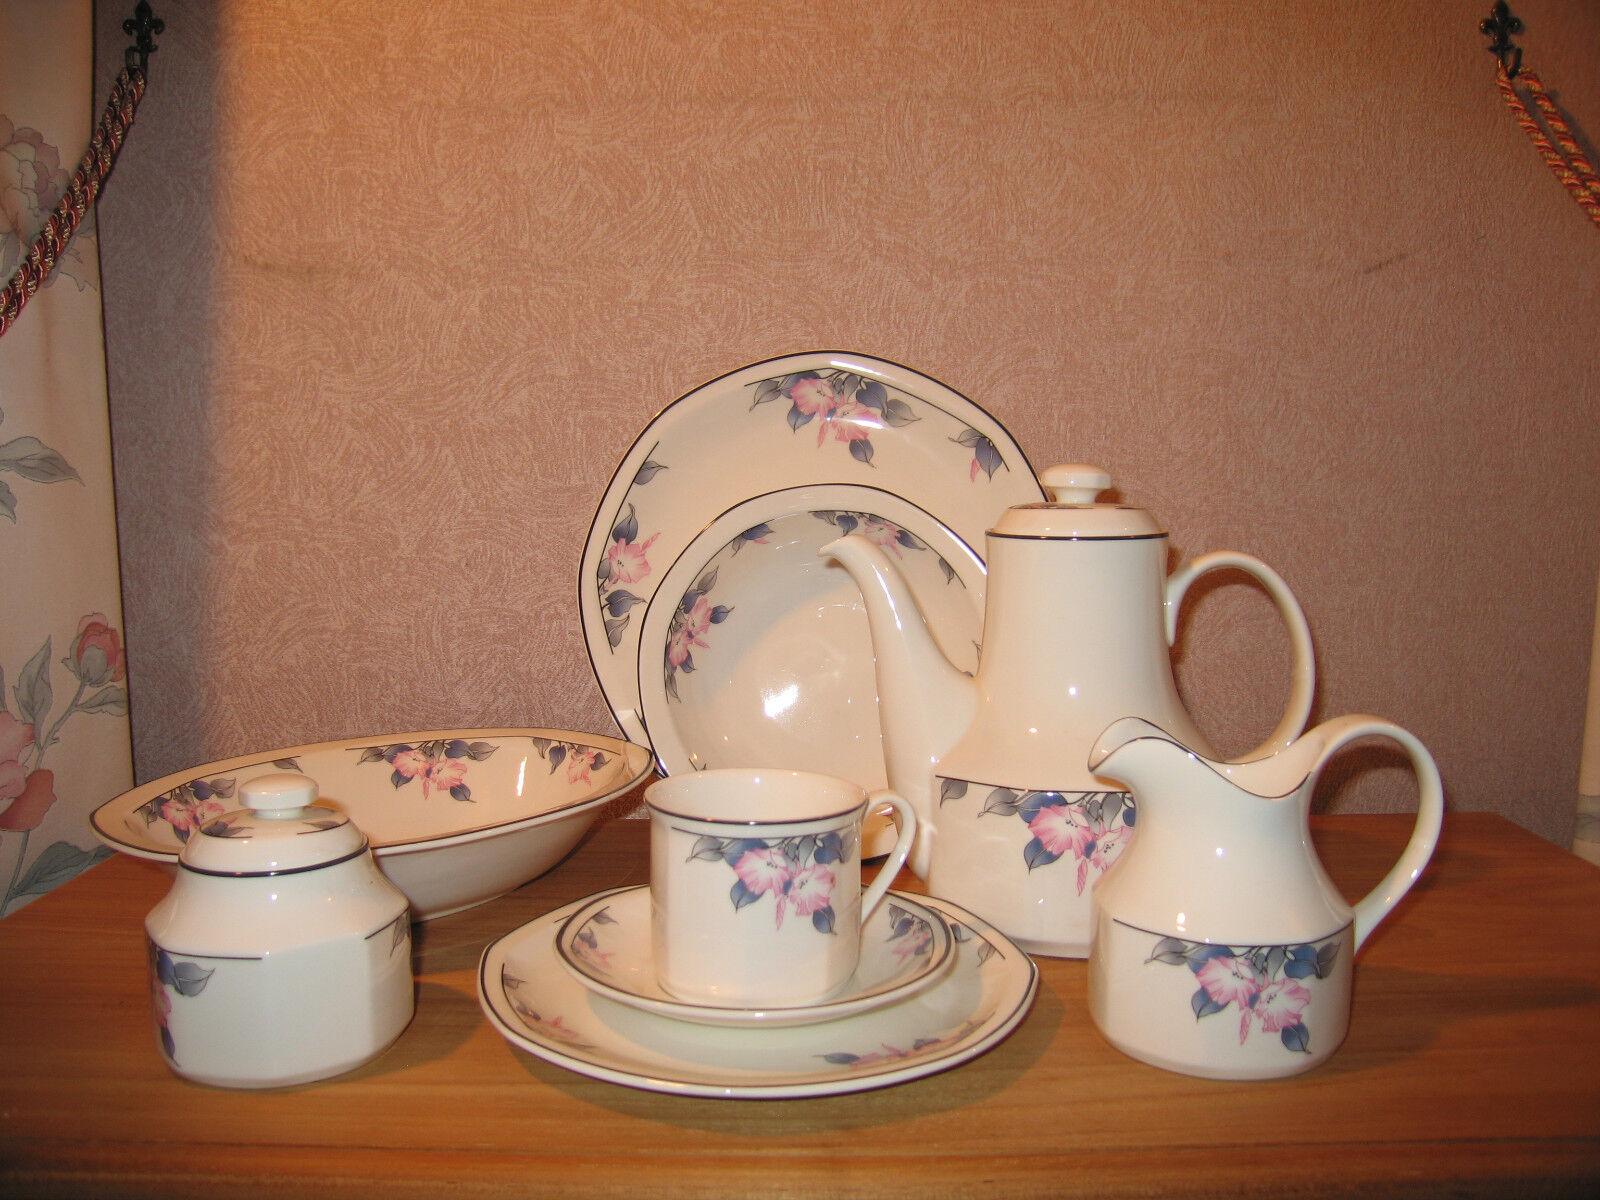 ROYAL DOULTON NEW BLOOMSBURY Set crémier + sucrier Set milk jug + sugar bowl